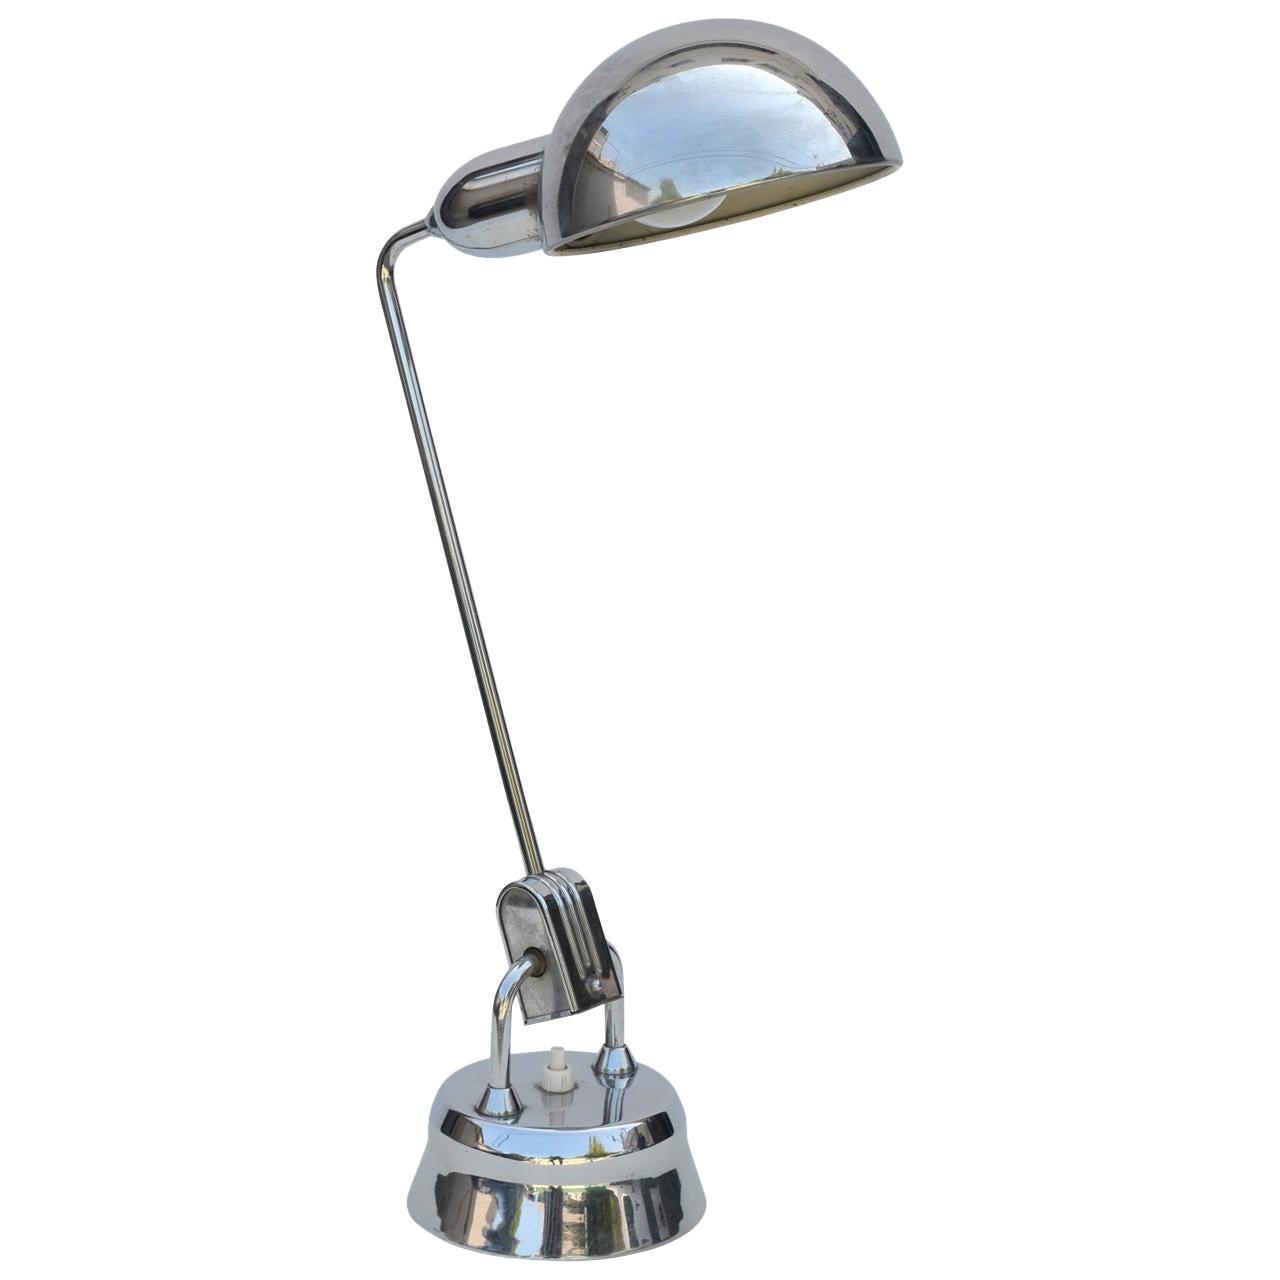 Original Jumo 600 Chrome Lamp Selected by Charlotte Perriand